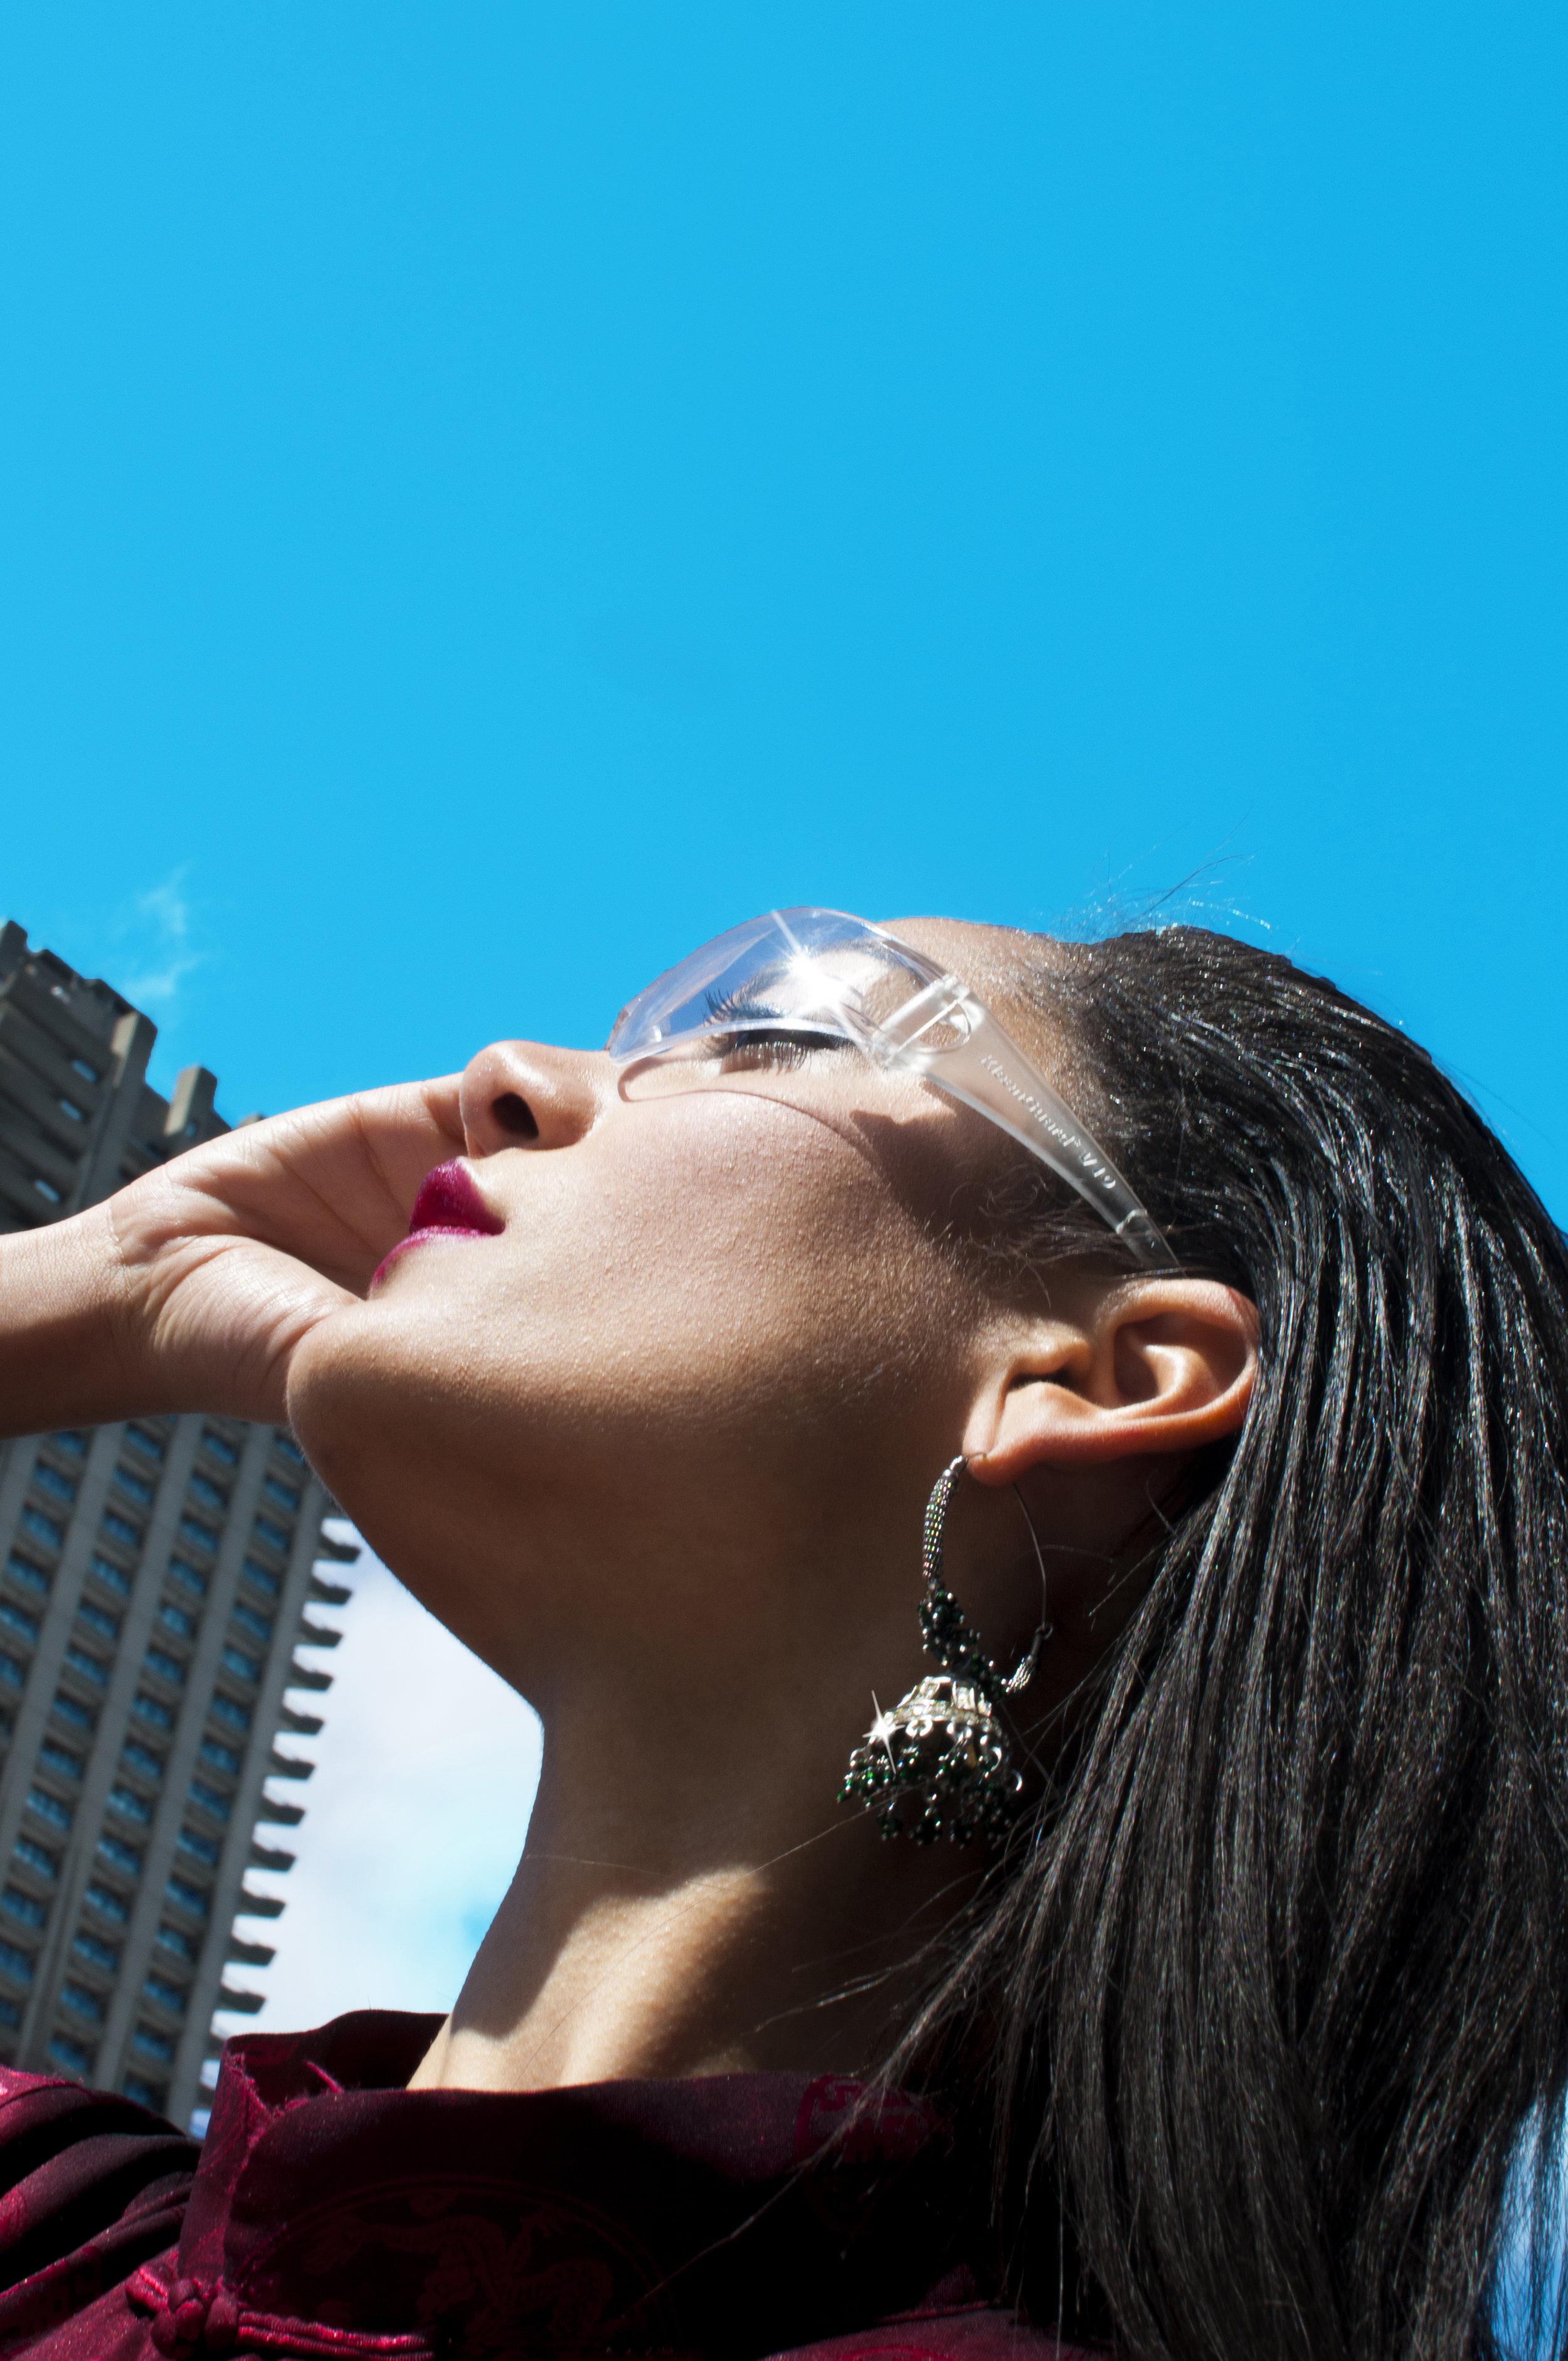 - Photography by Isaac Kariuki